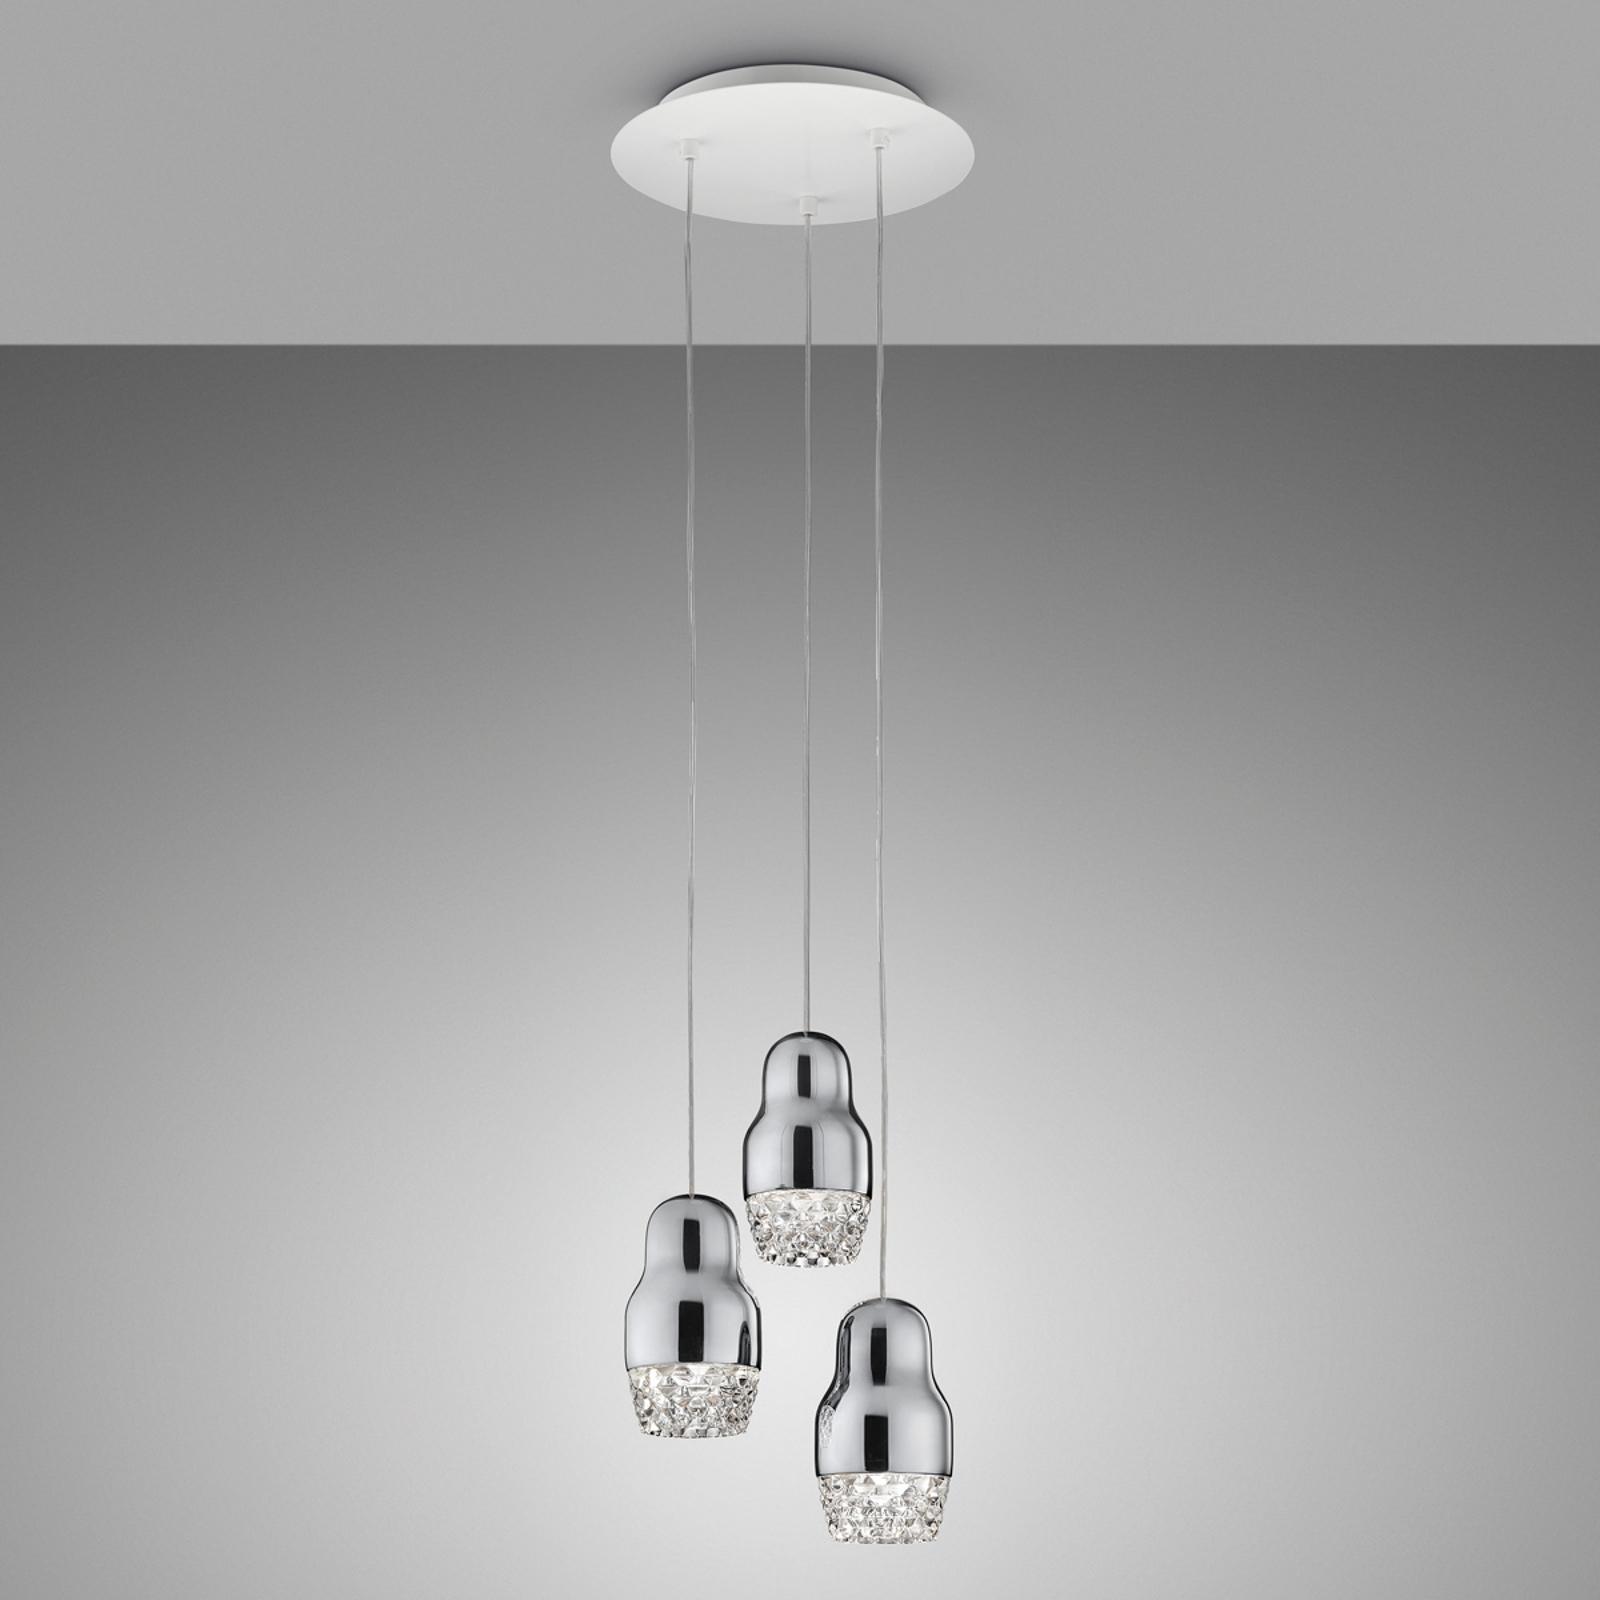 Axolight Fedora LED závesné svietidlo chróm 3pl_1088083_1